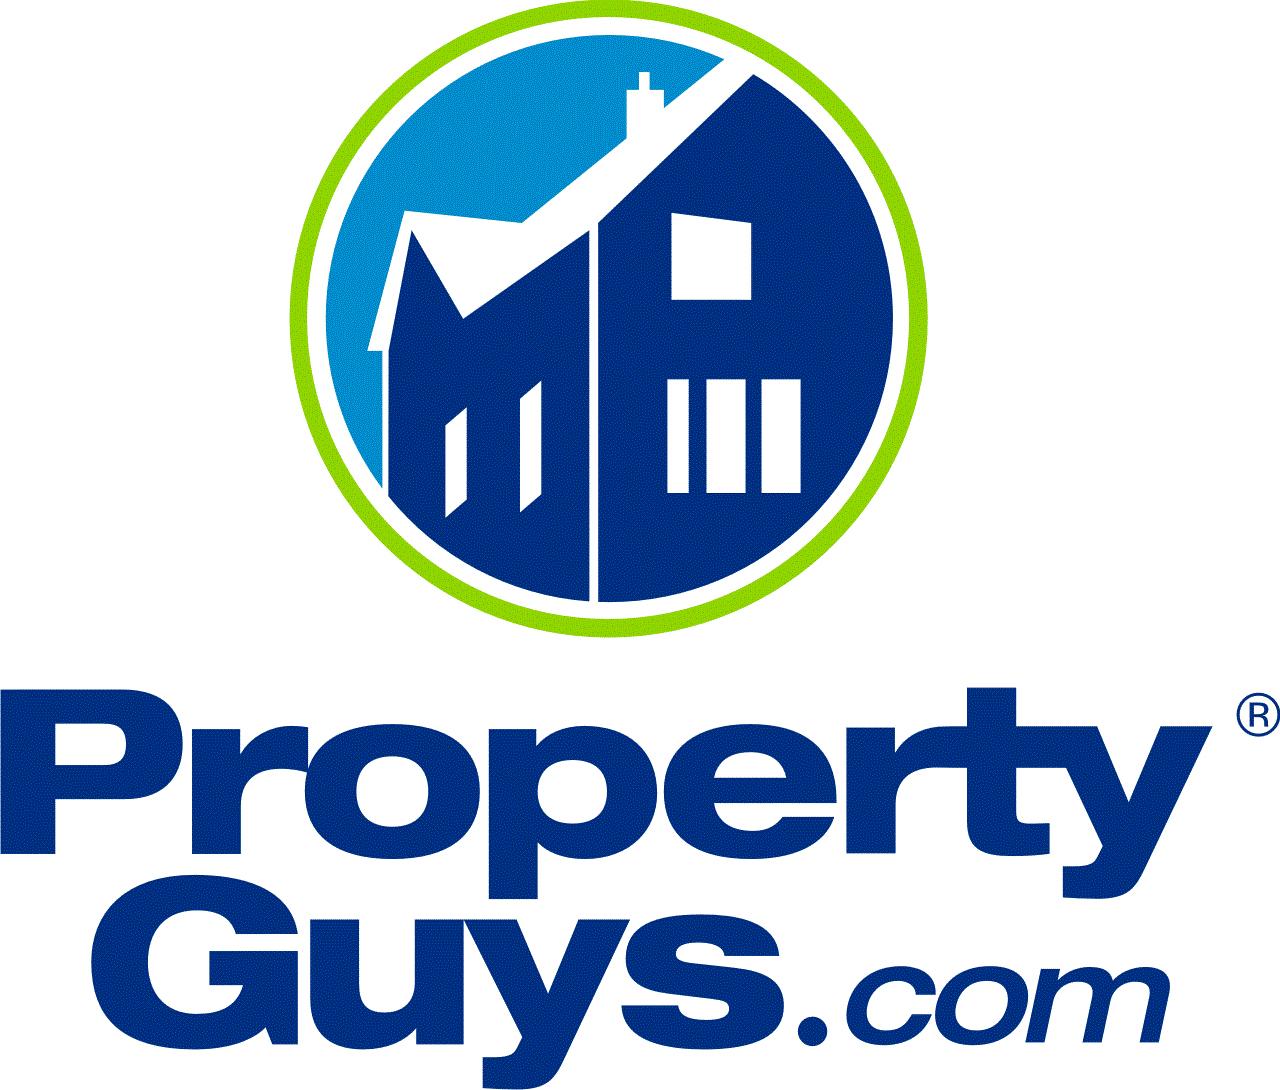 Propertyguys logo jpg